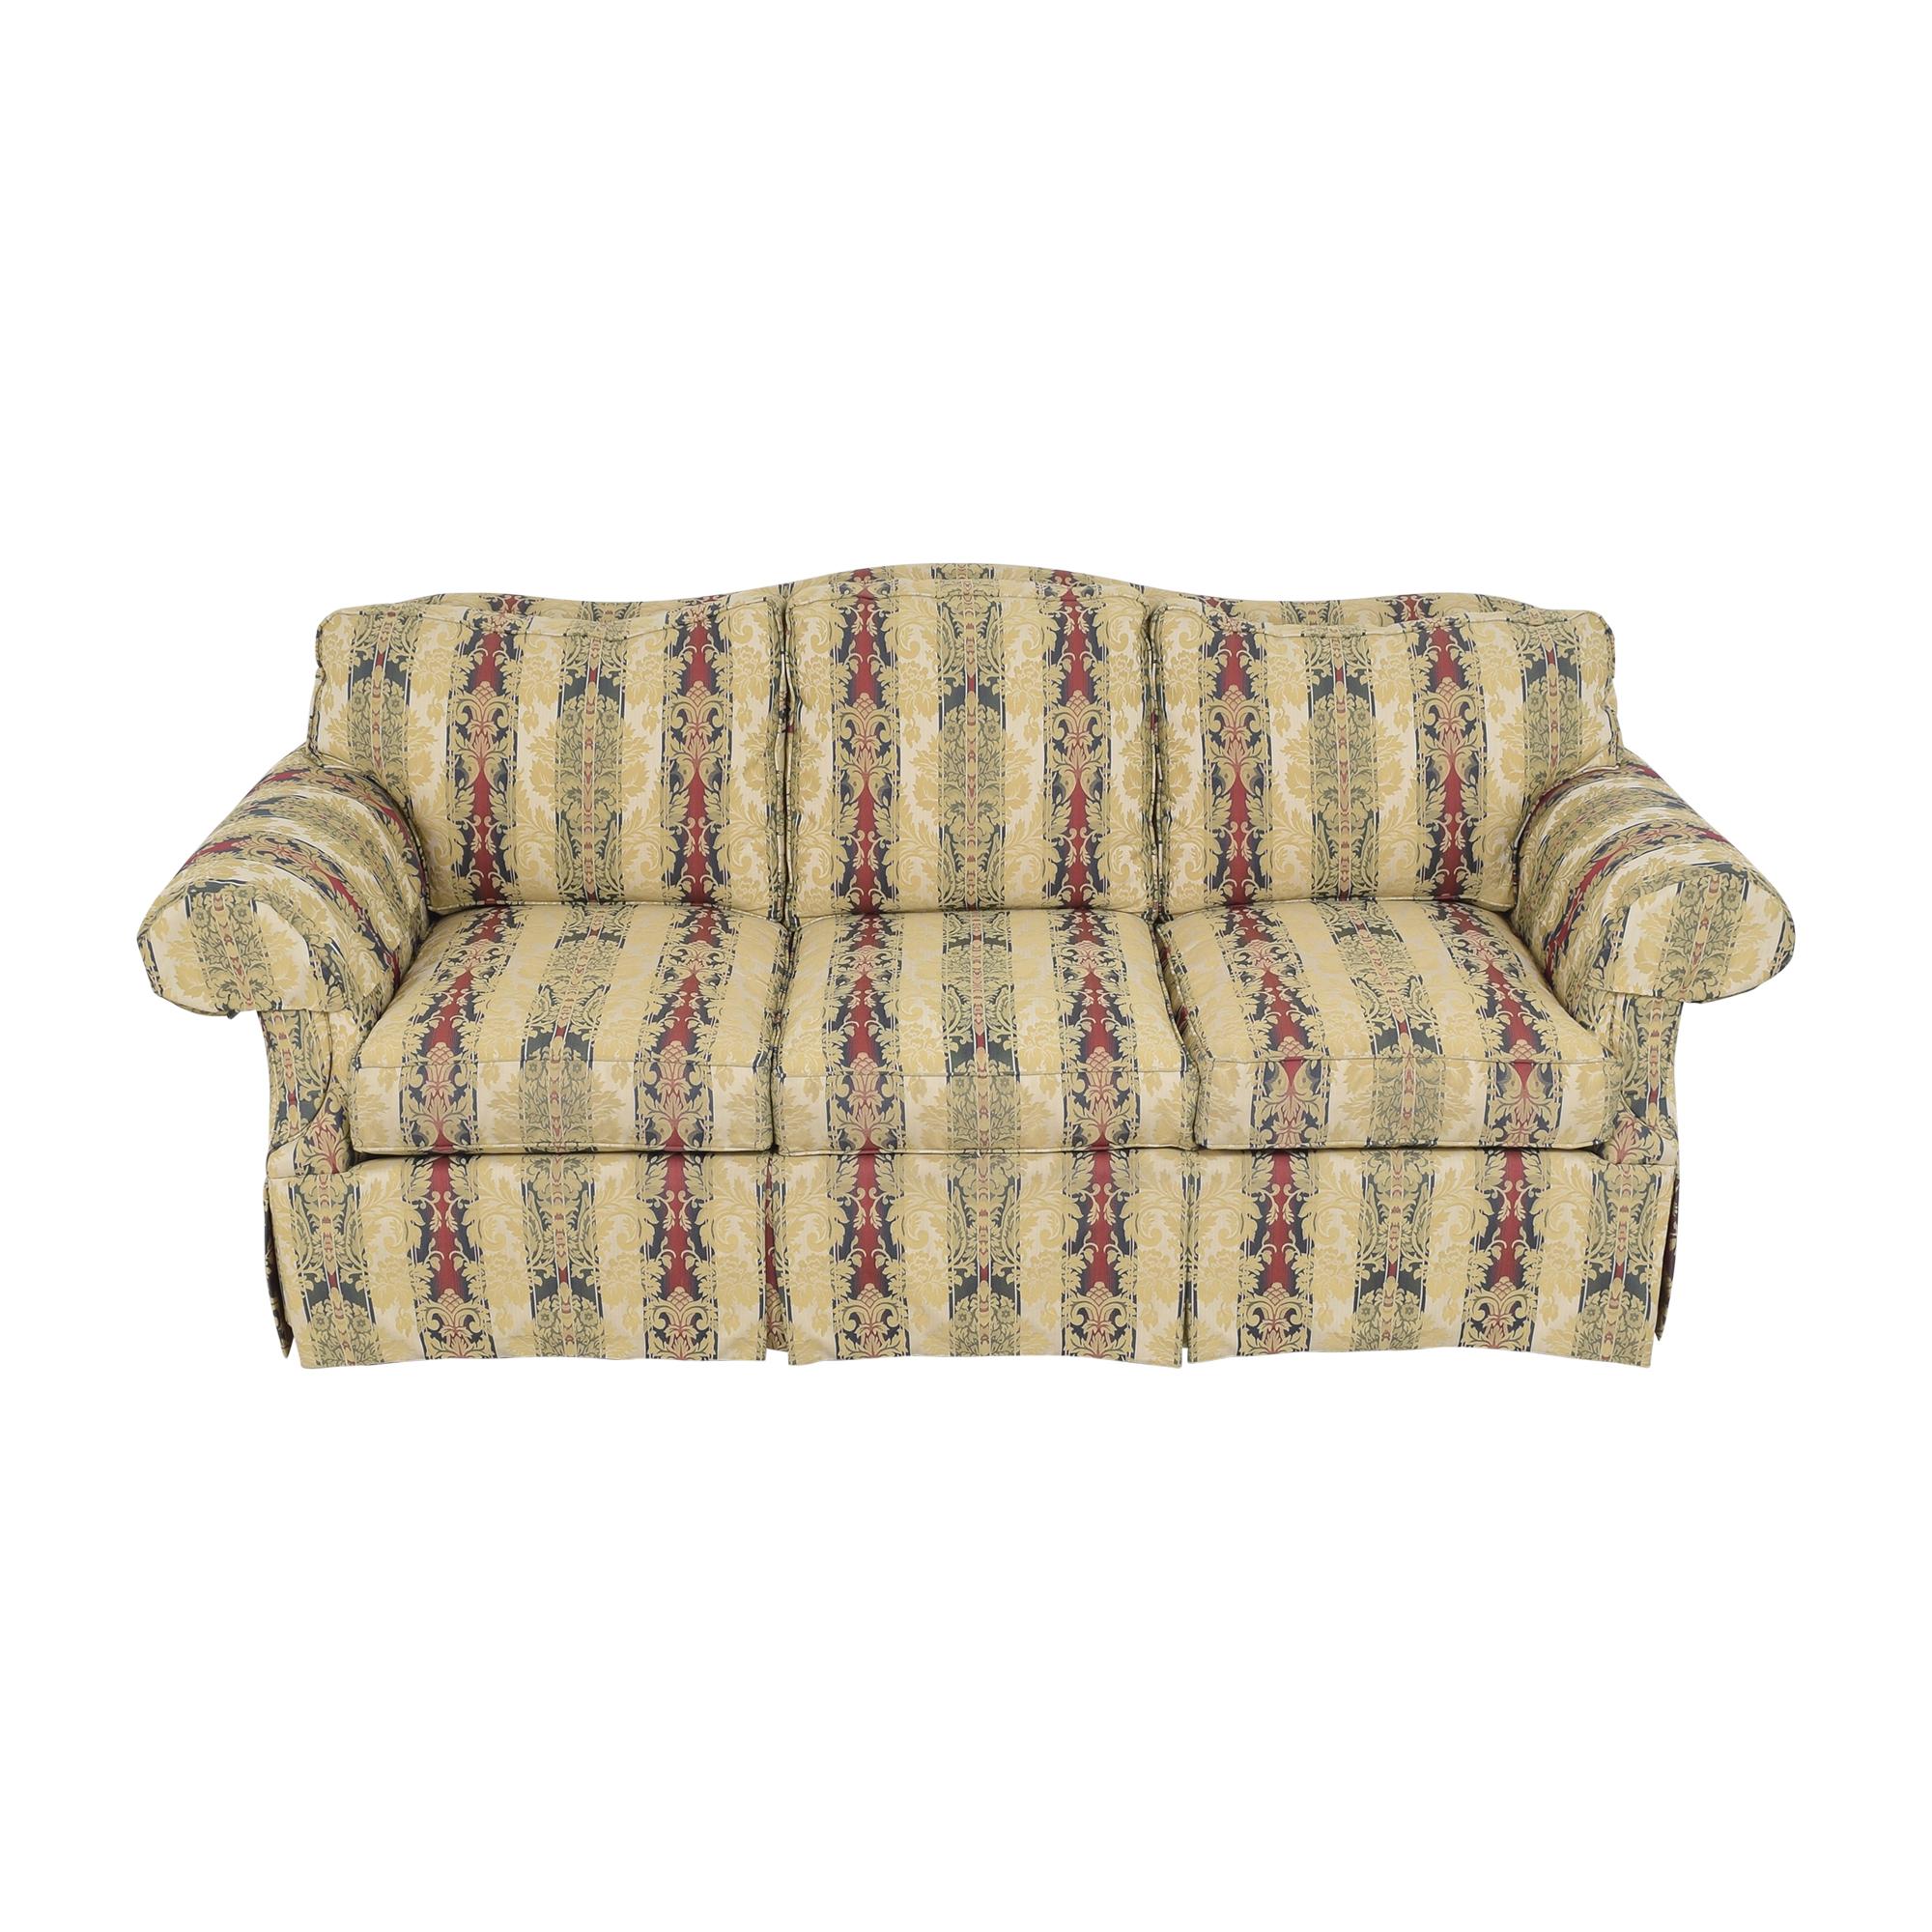 Ethan Allen Ethan Allen Stripe Damask Sofa